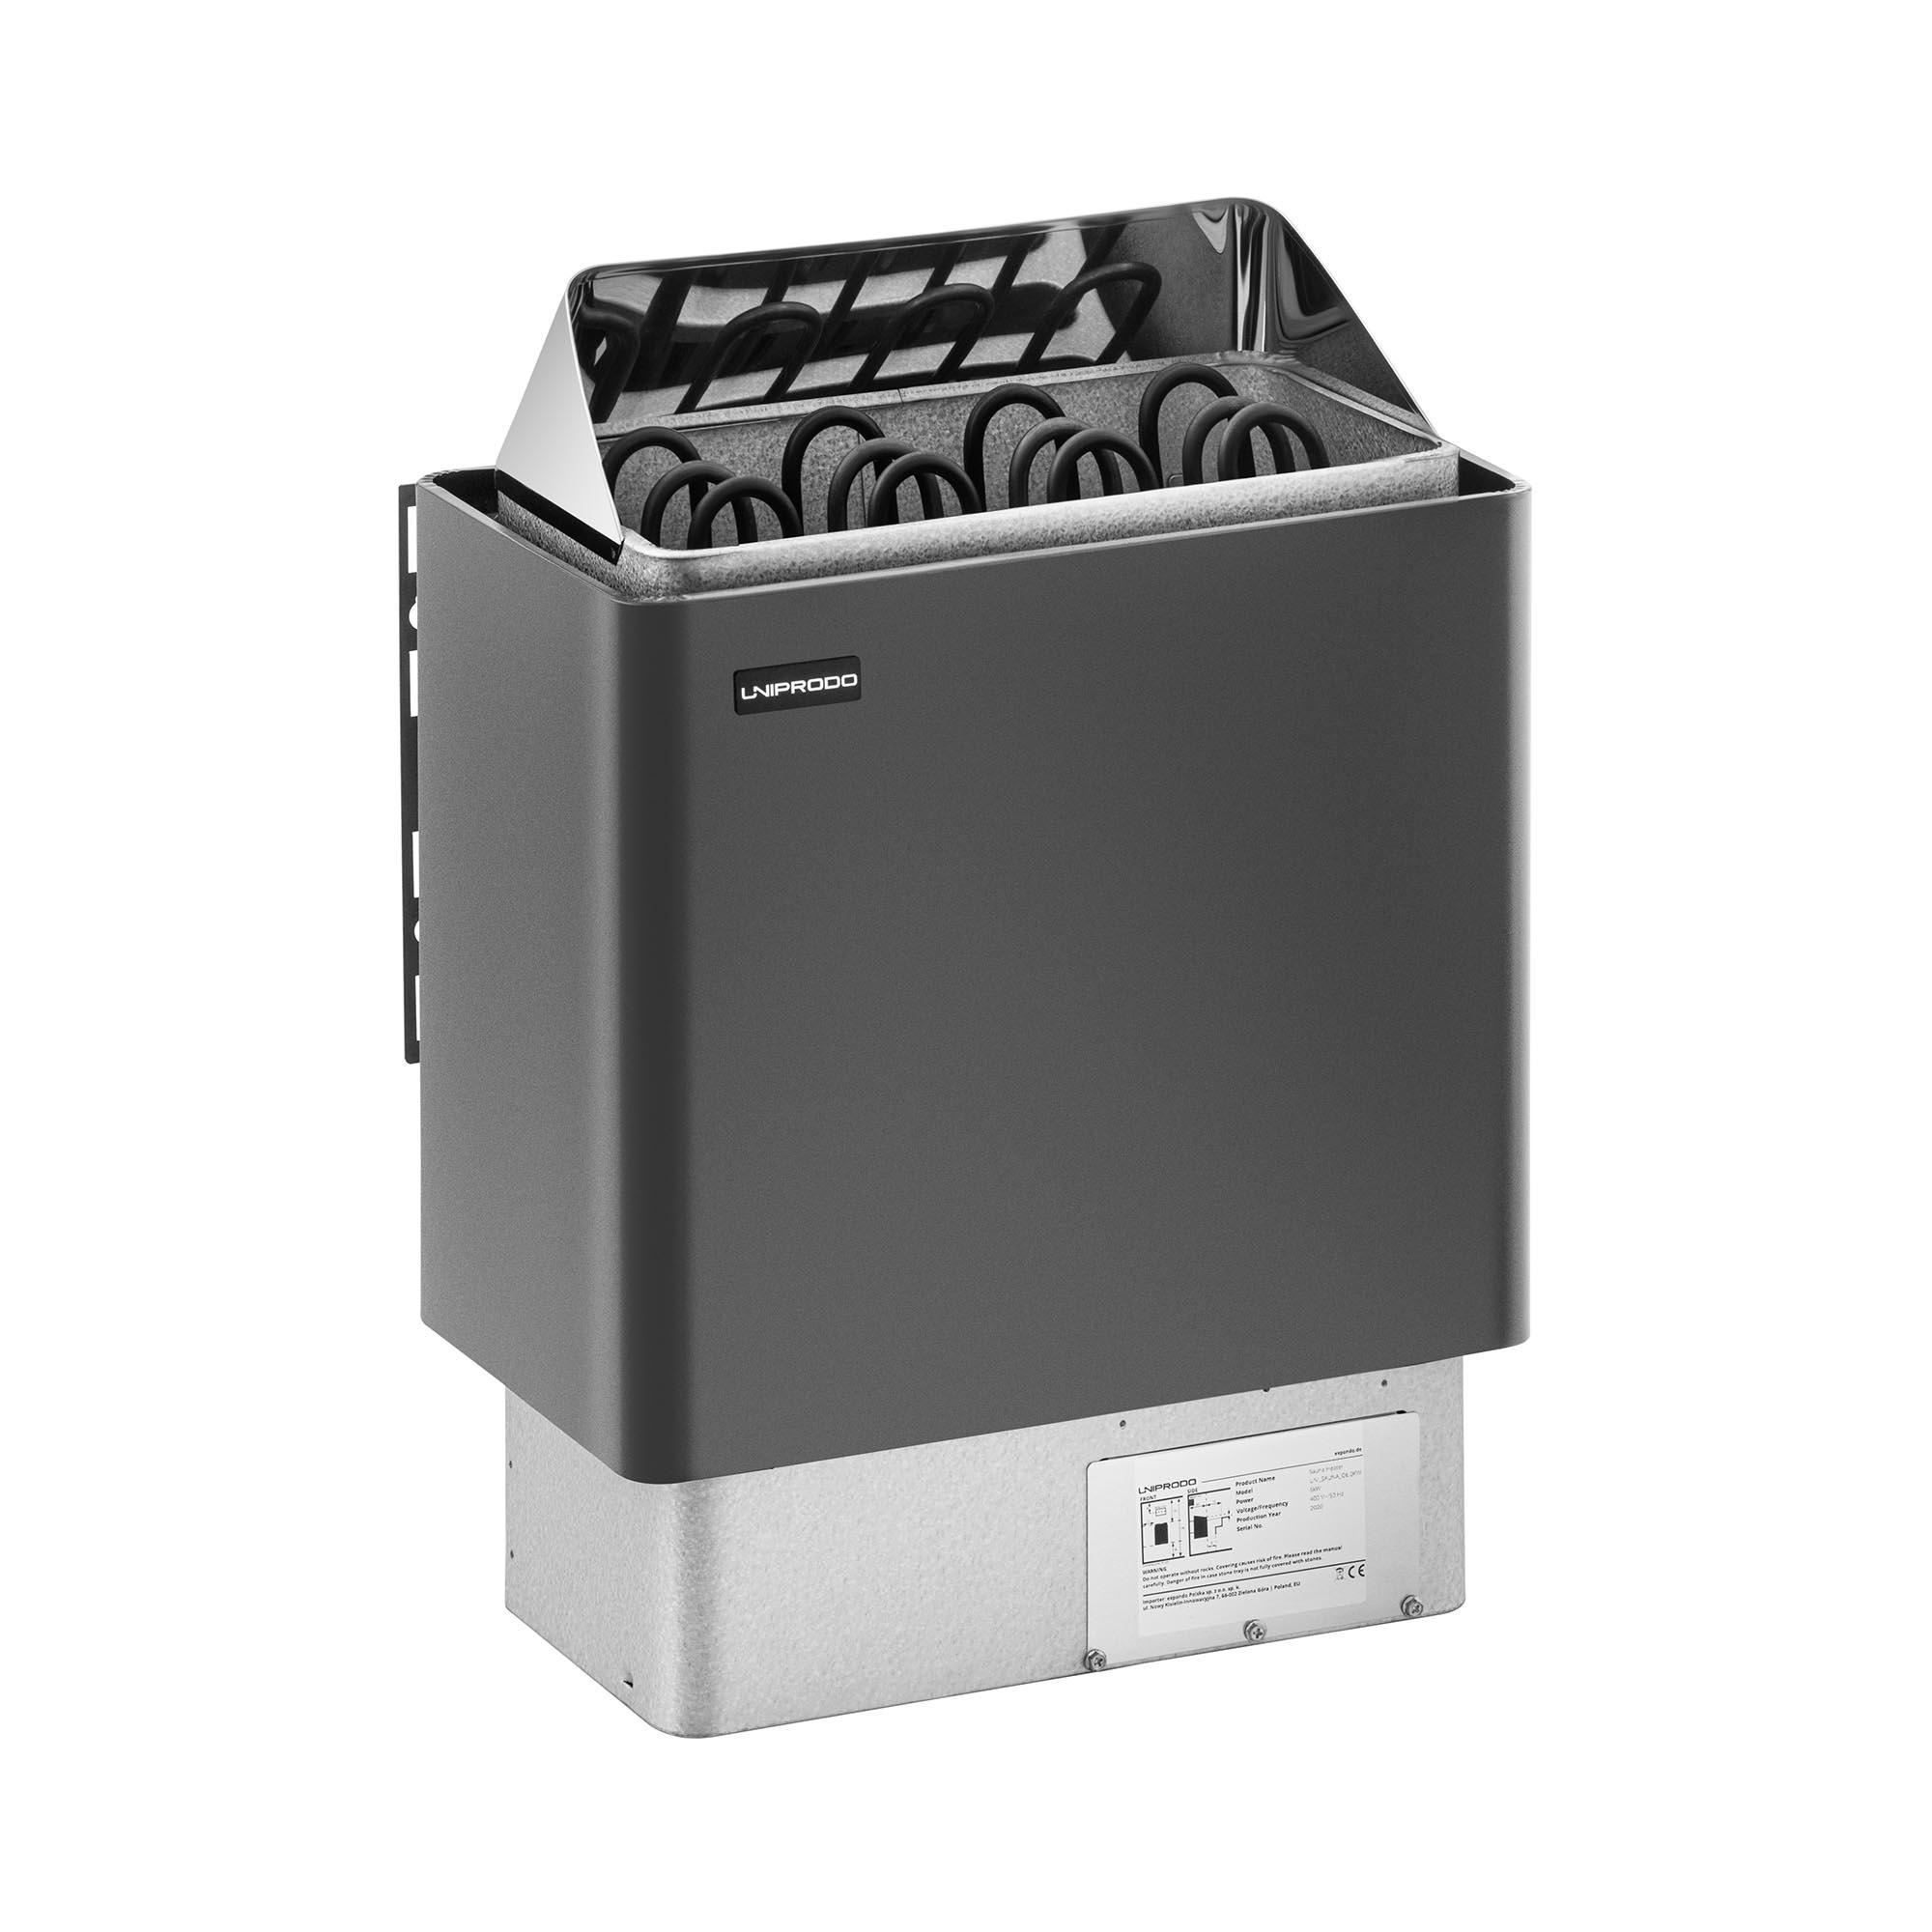 Uniprodo Saunaovn - 6 kW - 30 til 110 °C UNI_SAUNA_G6.0KW